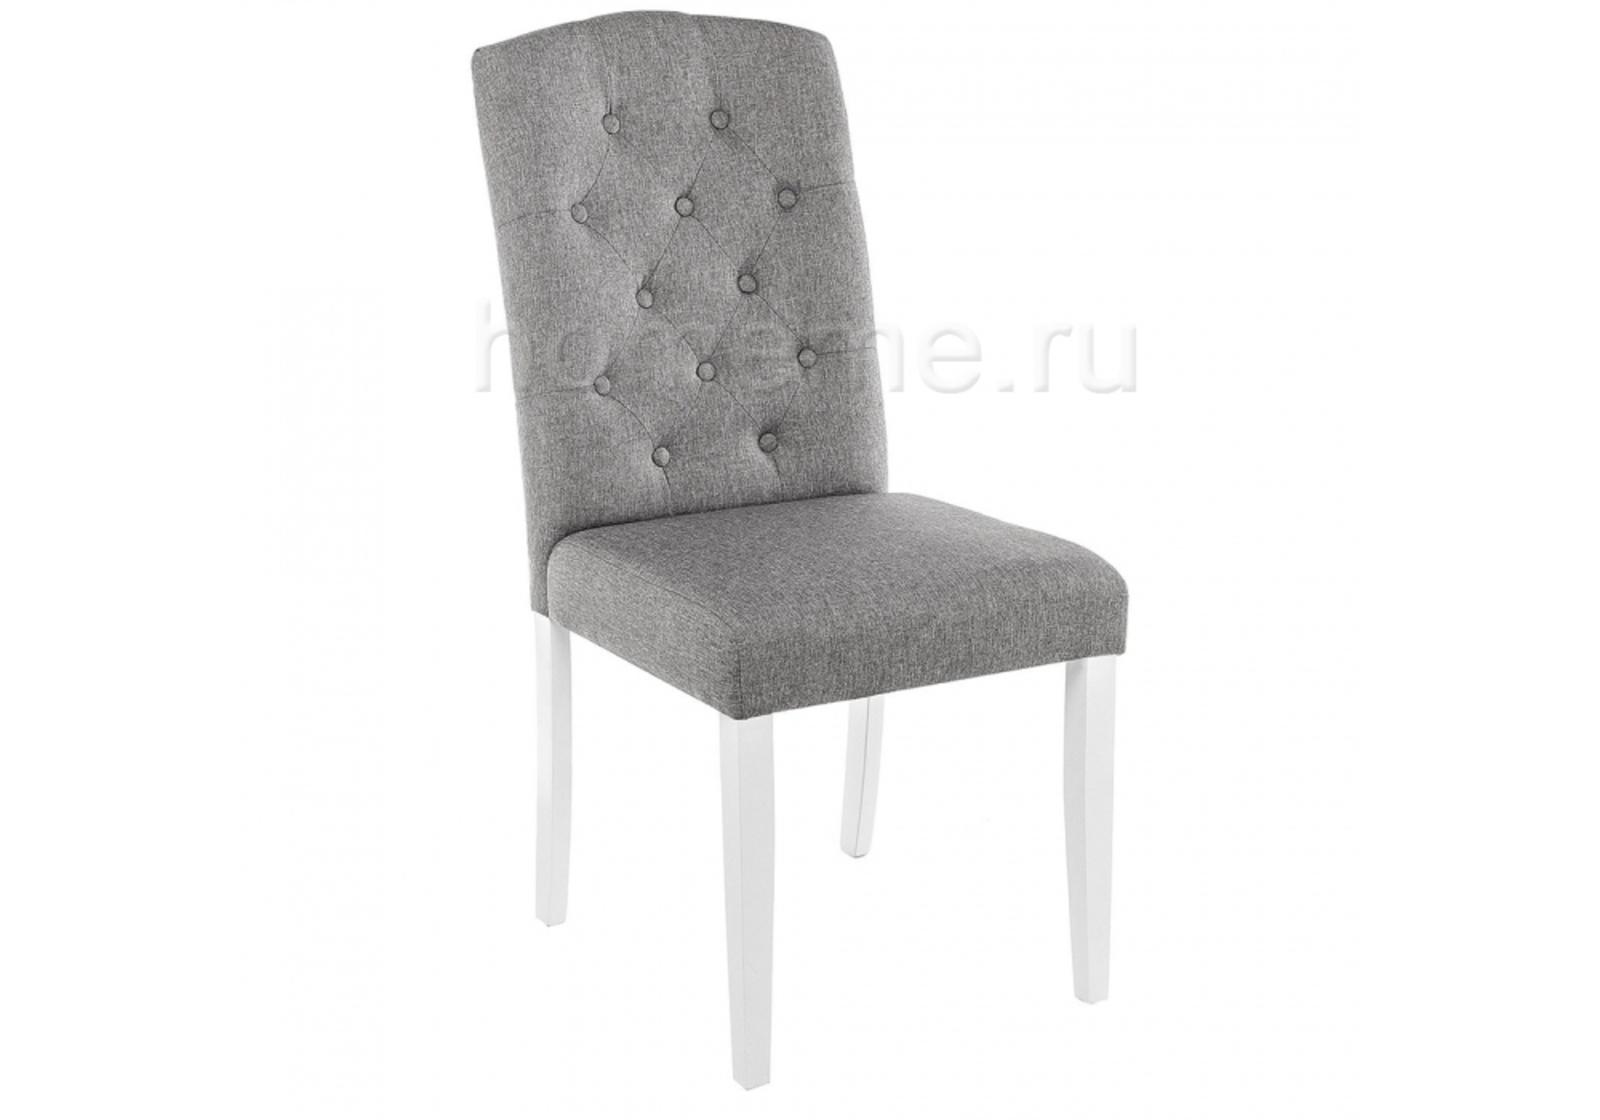 Стул HomeMe Menson white / fabric pebble 11025 от Homeme.ru